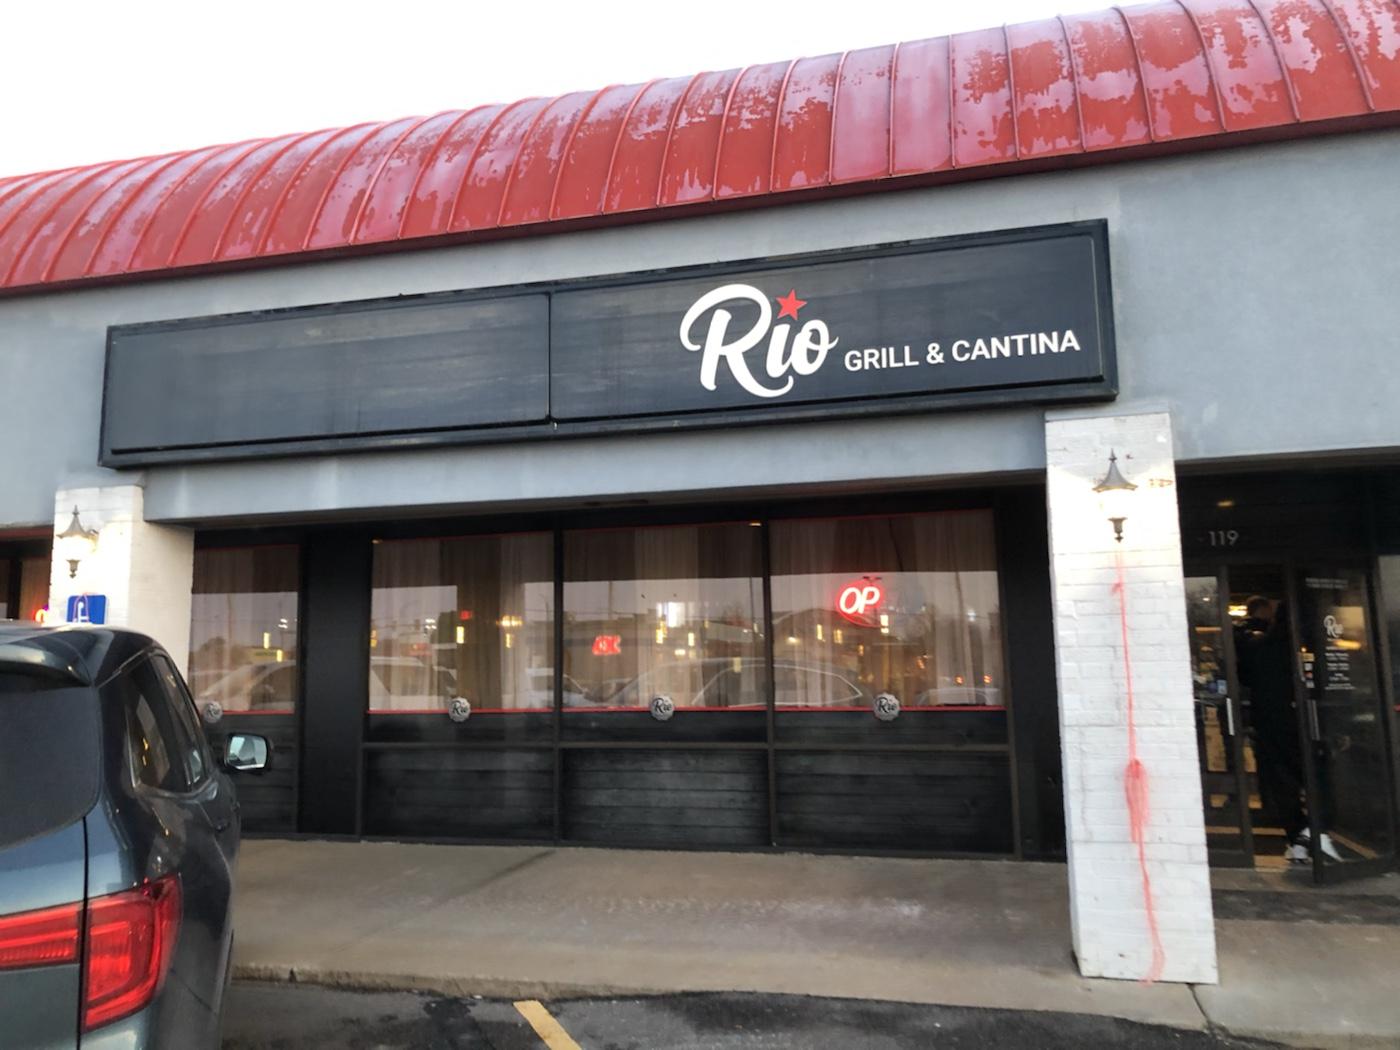 Rio Grill & Cantina